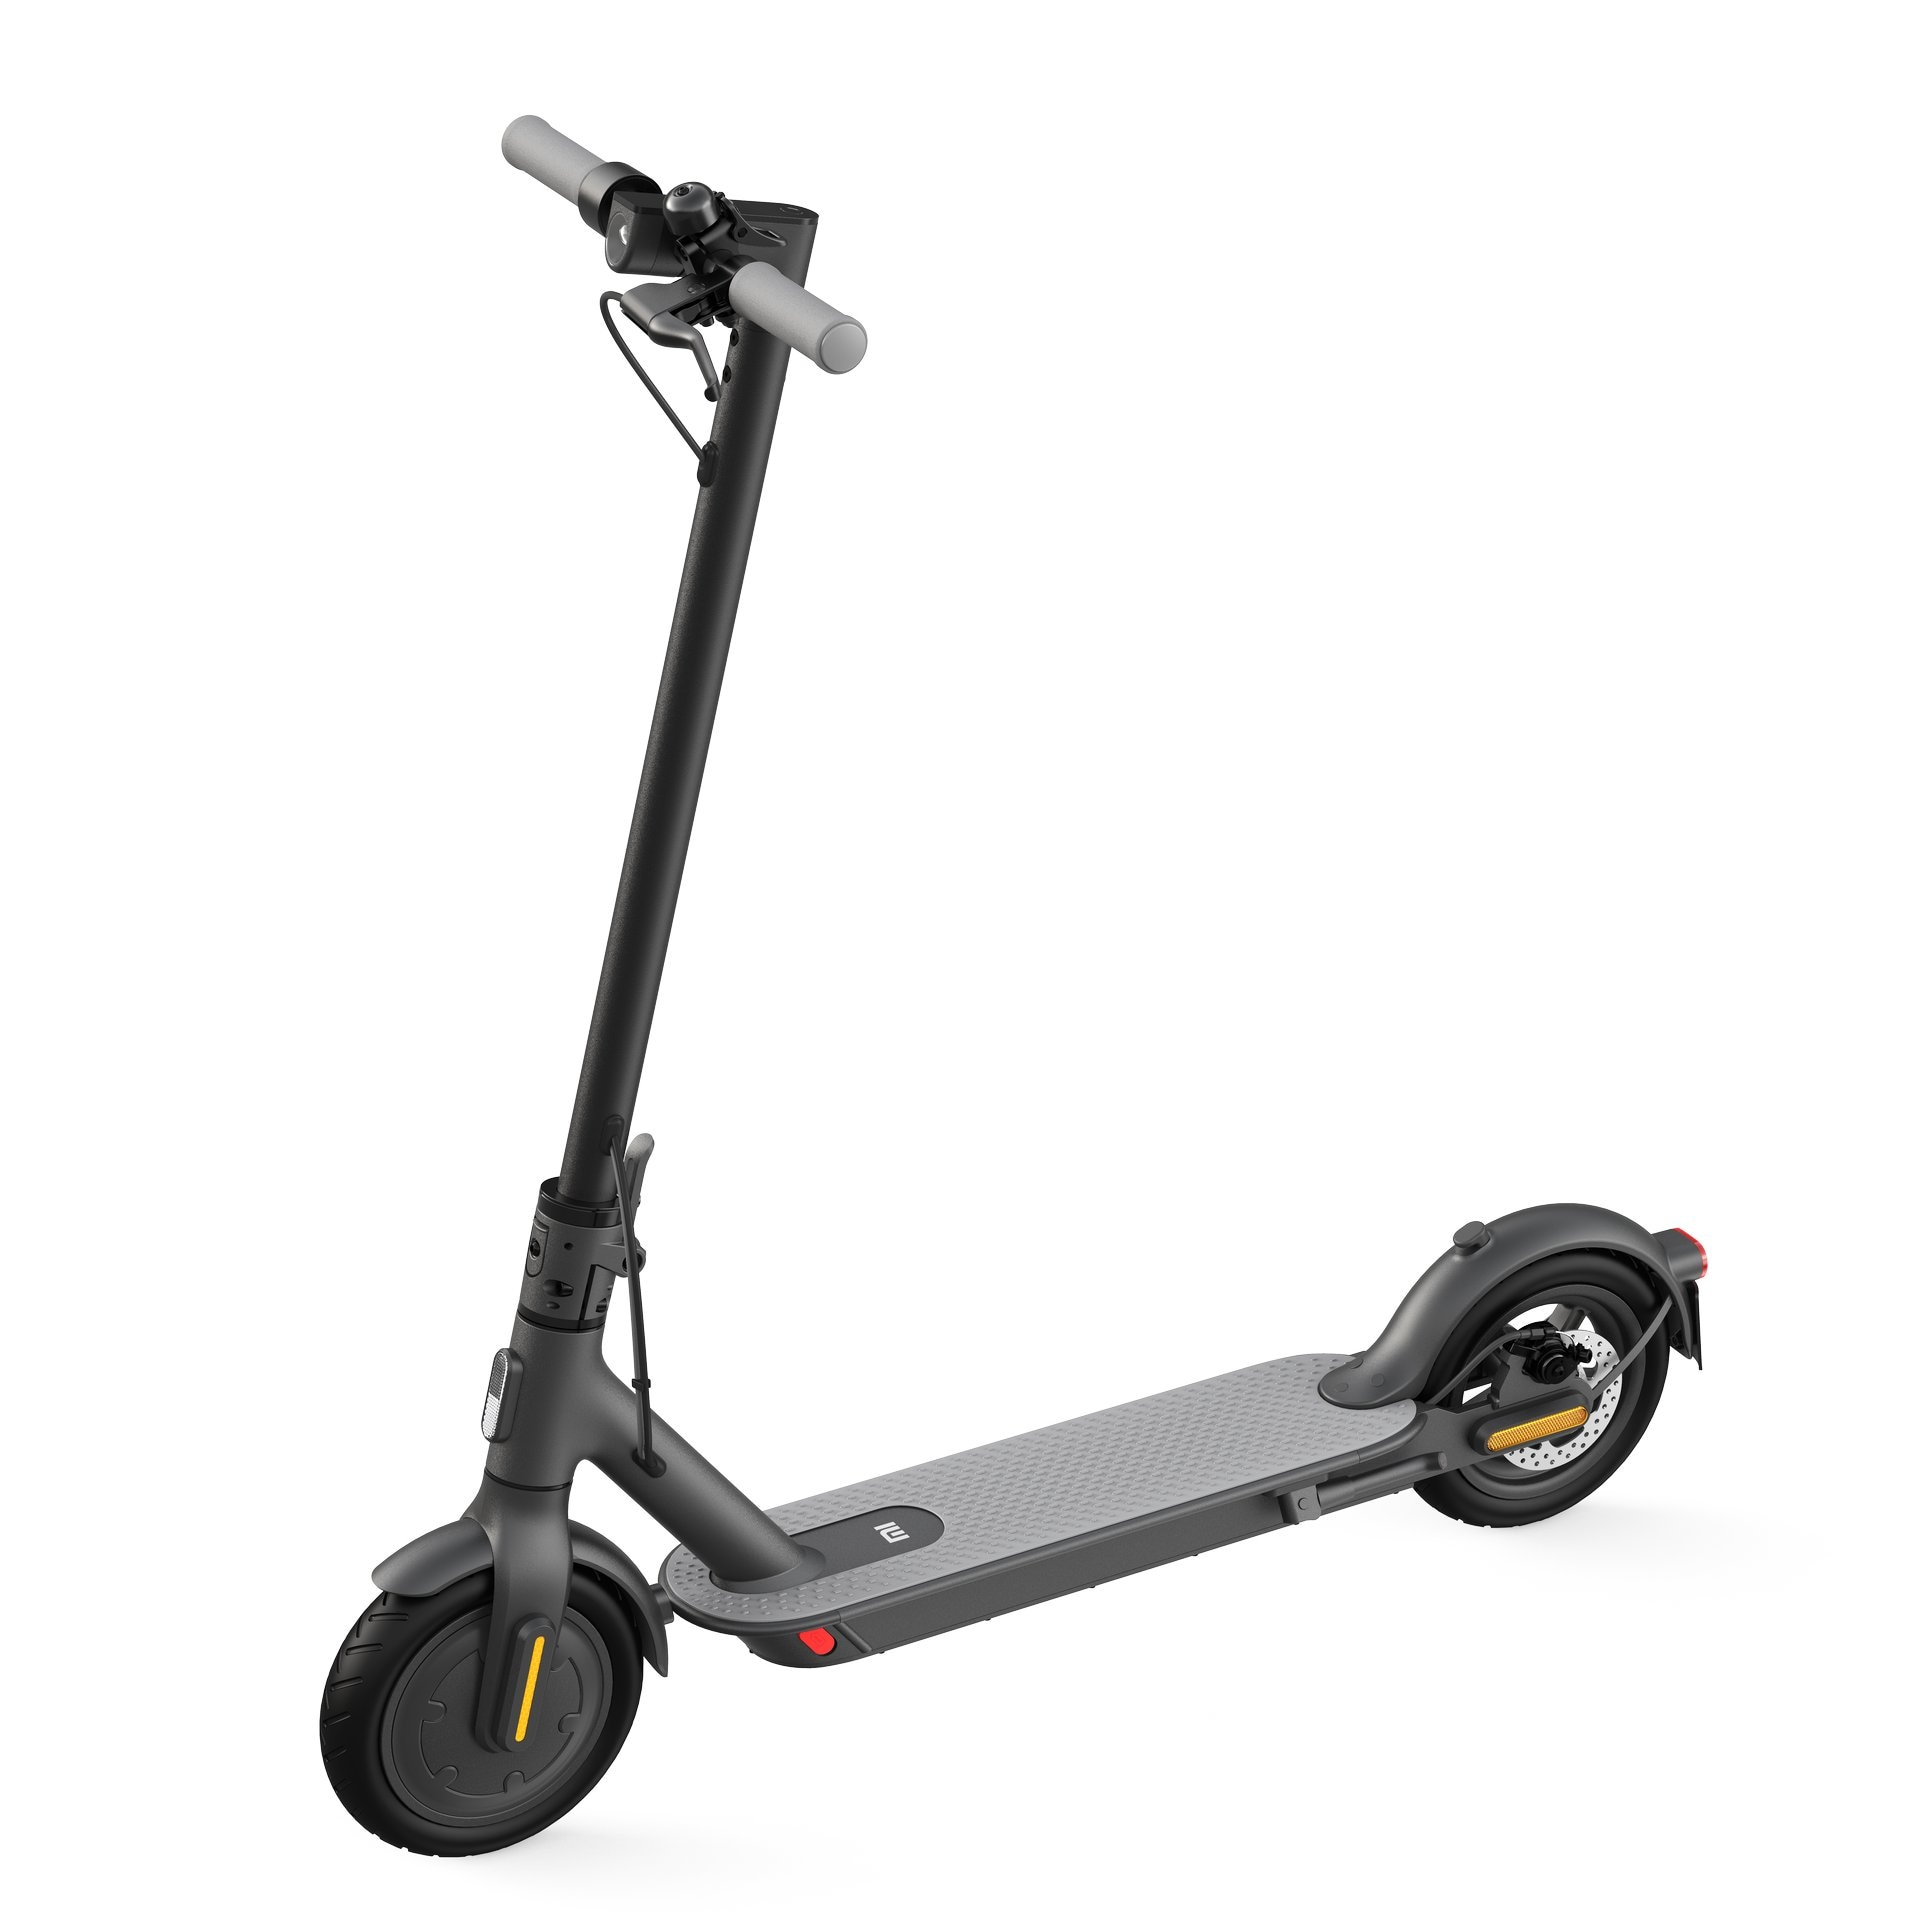 mi electric scooter essential (2)